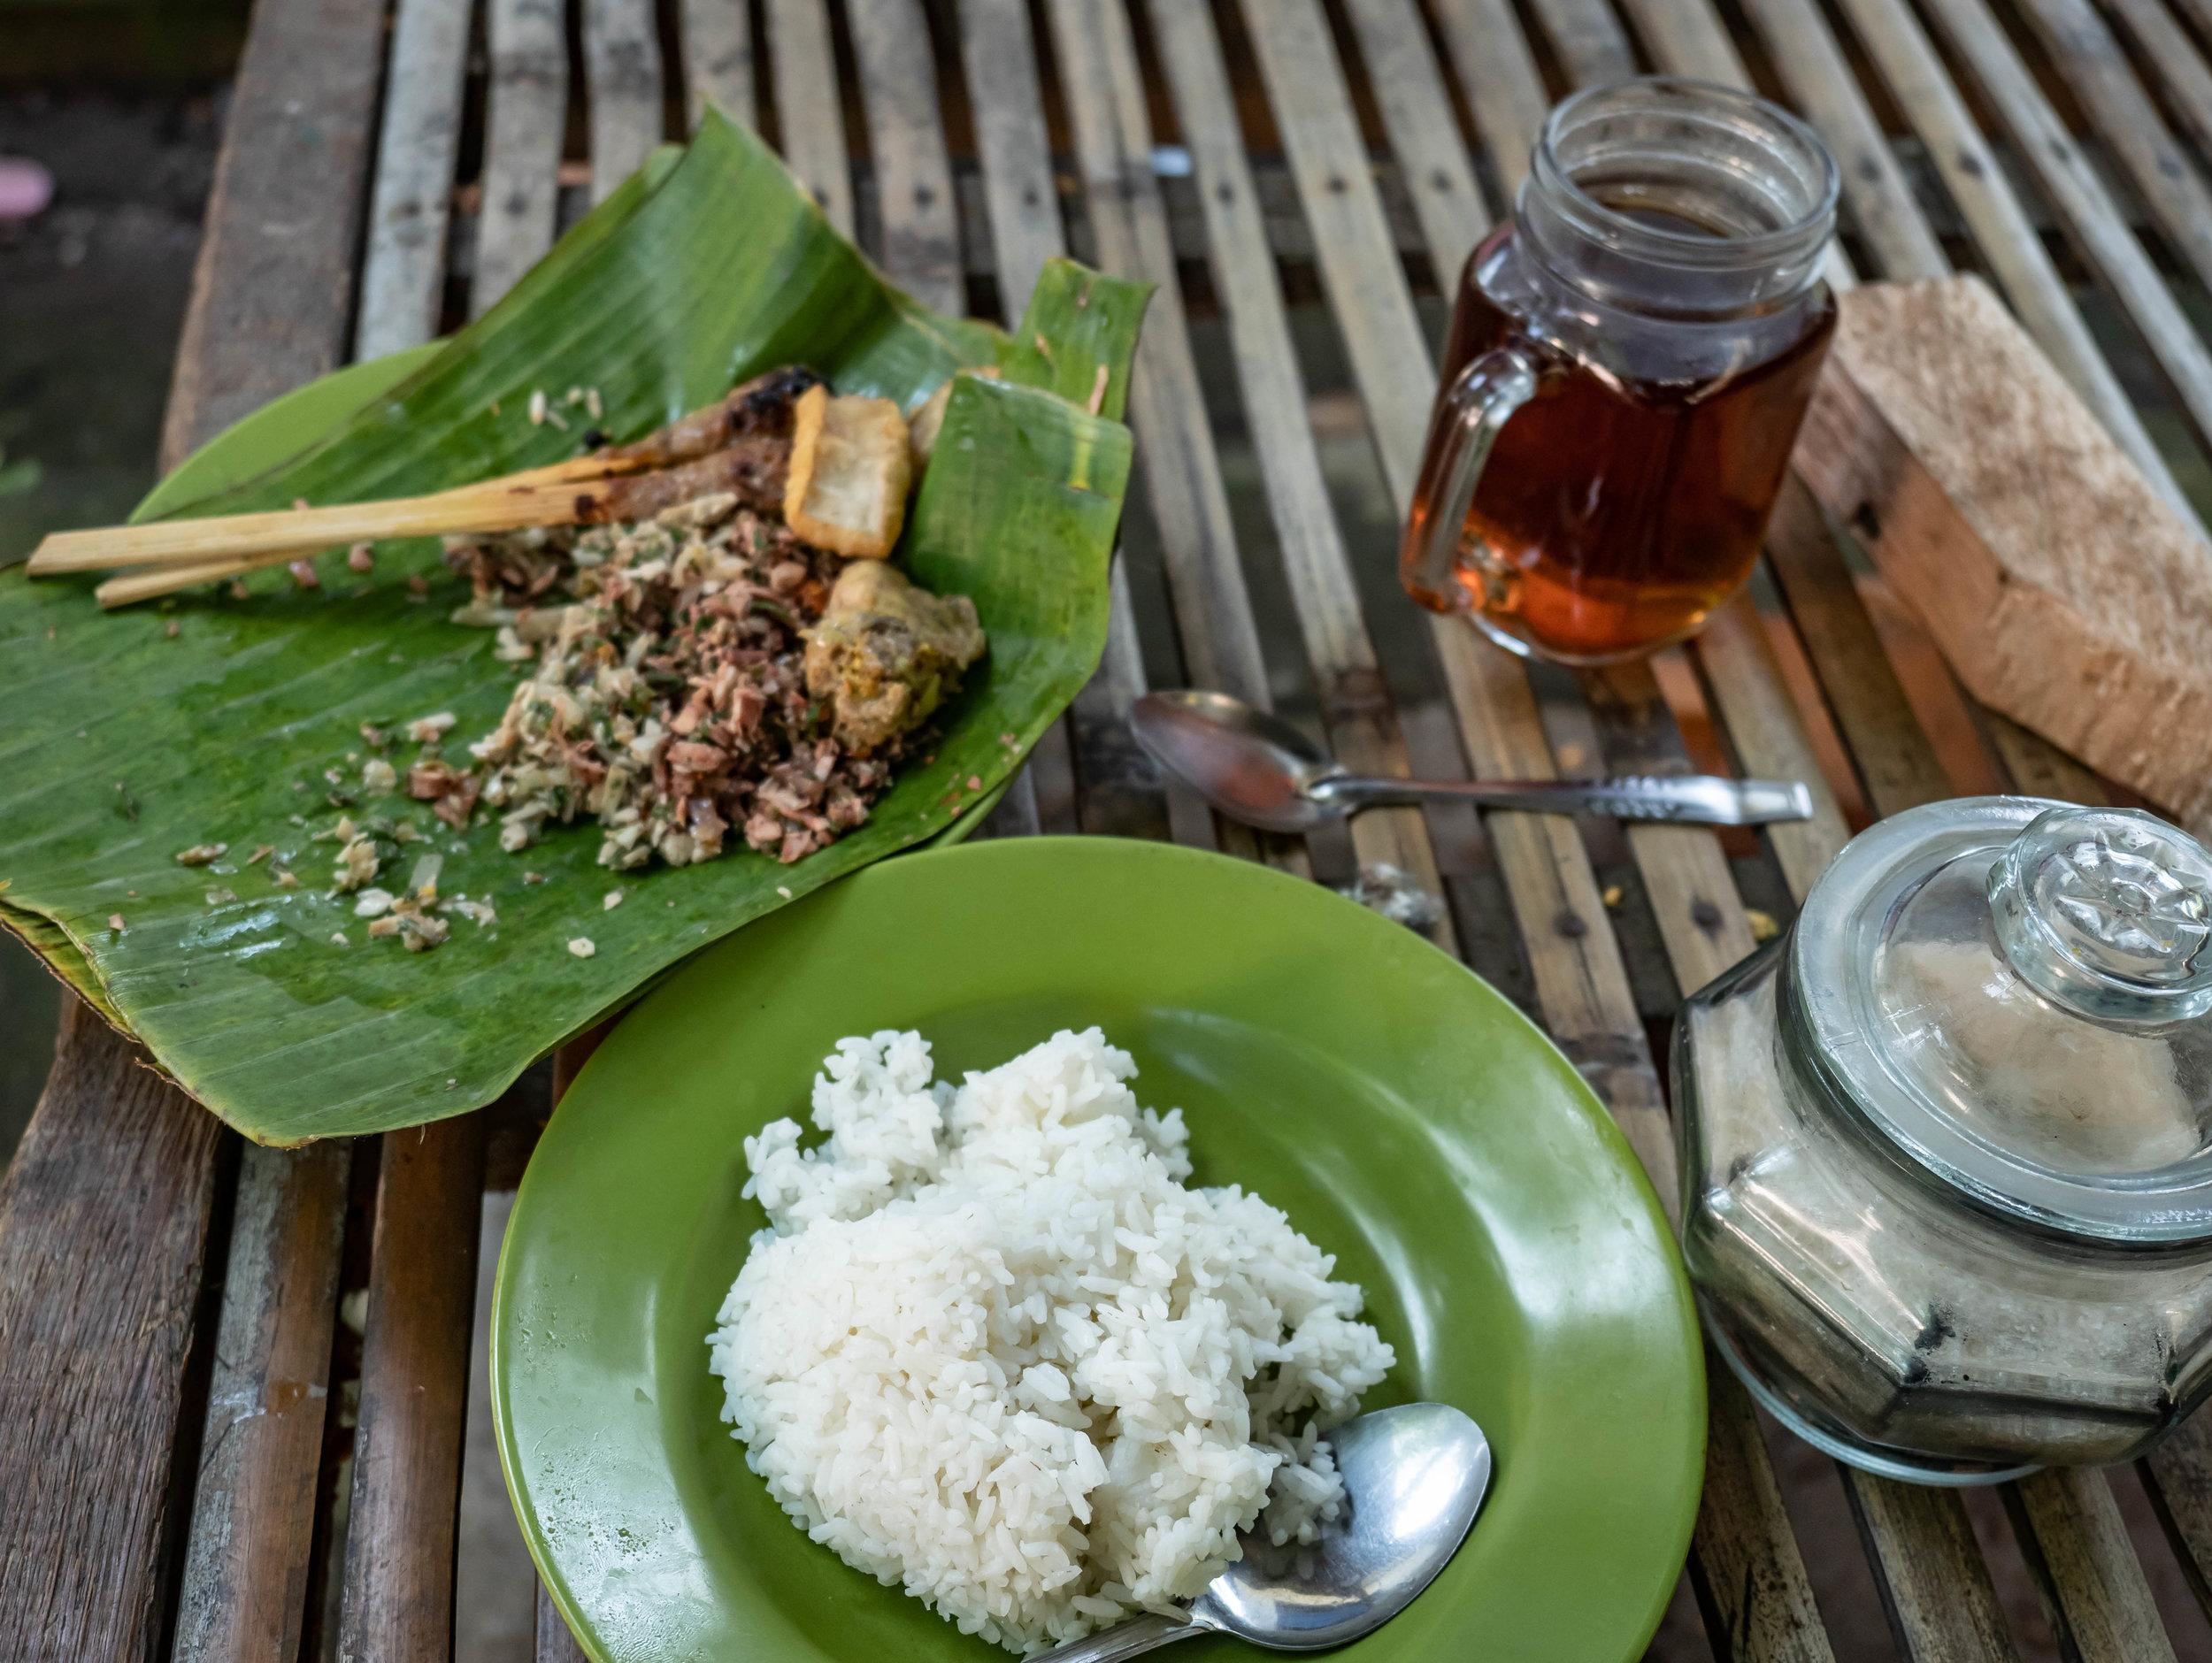 Bali authentic food